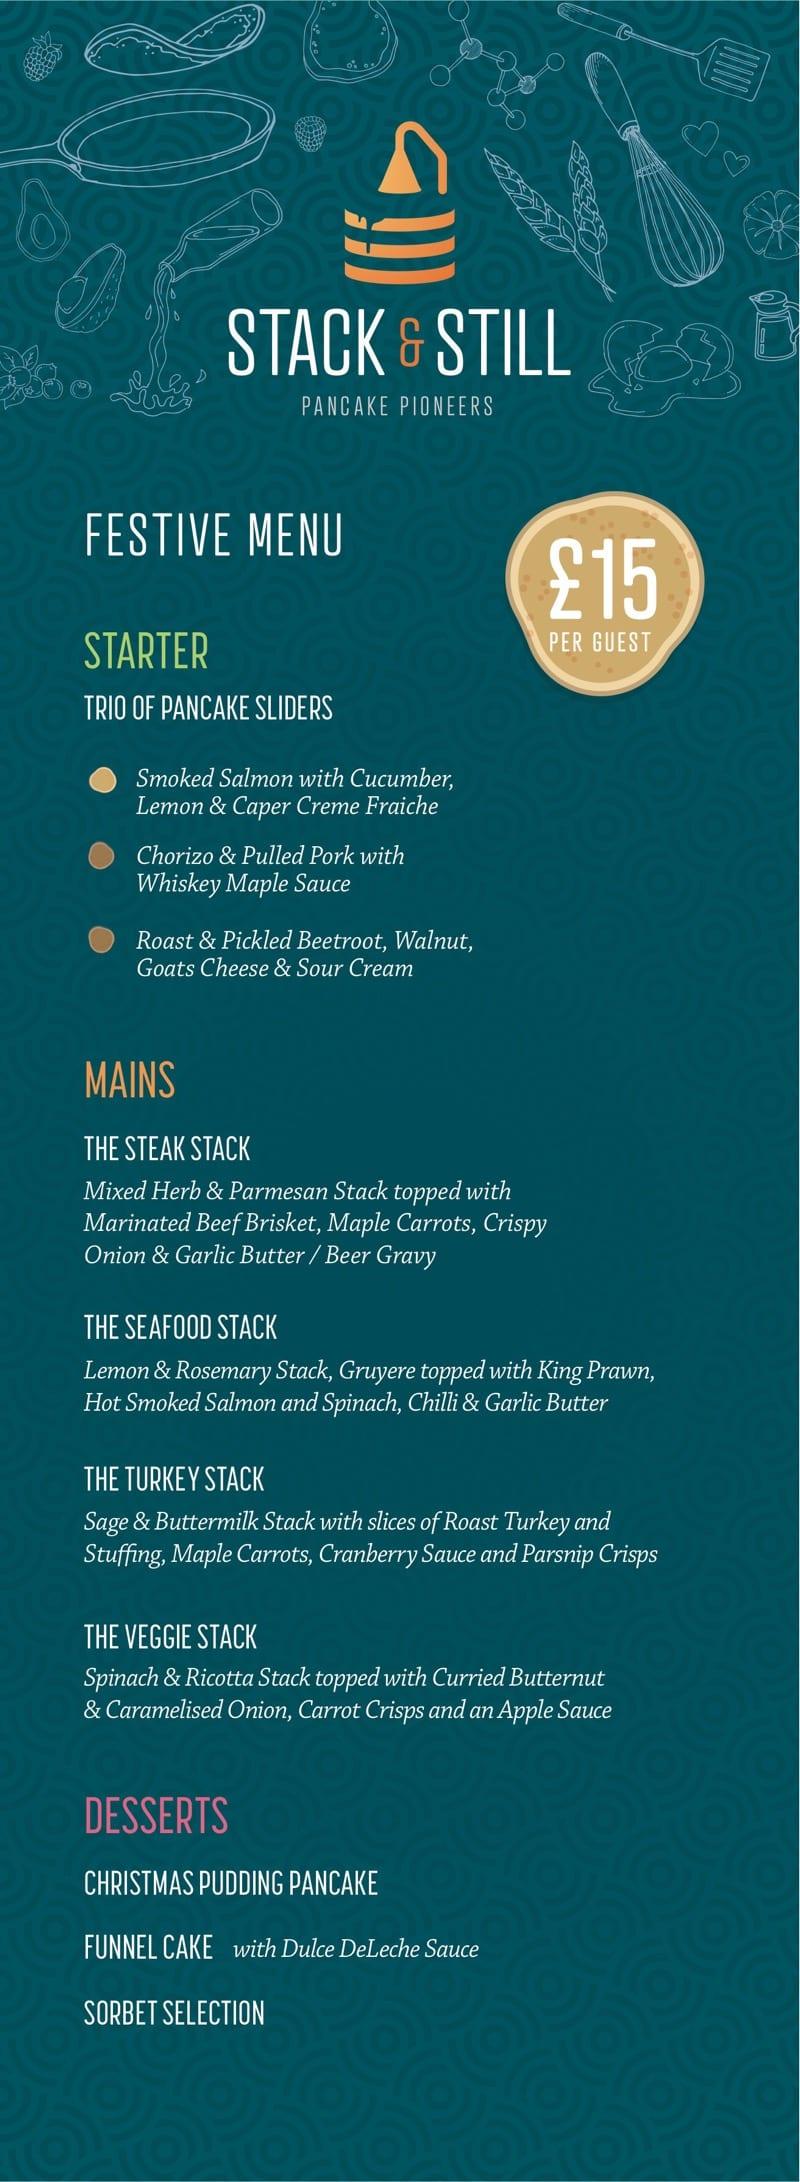 Stack and still Glasgow pancakes menu